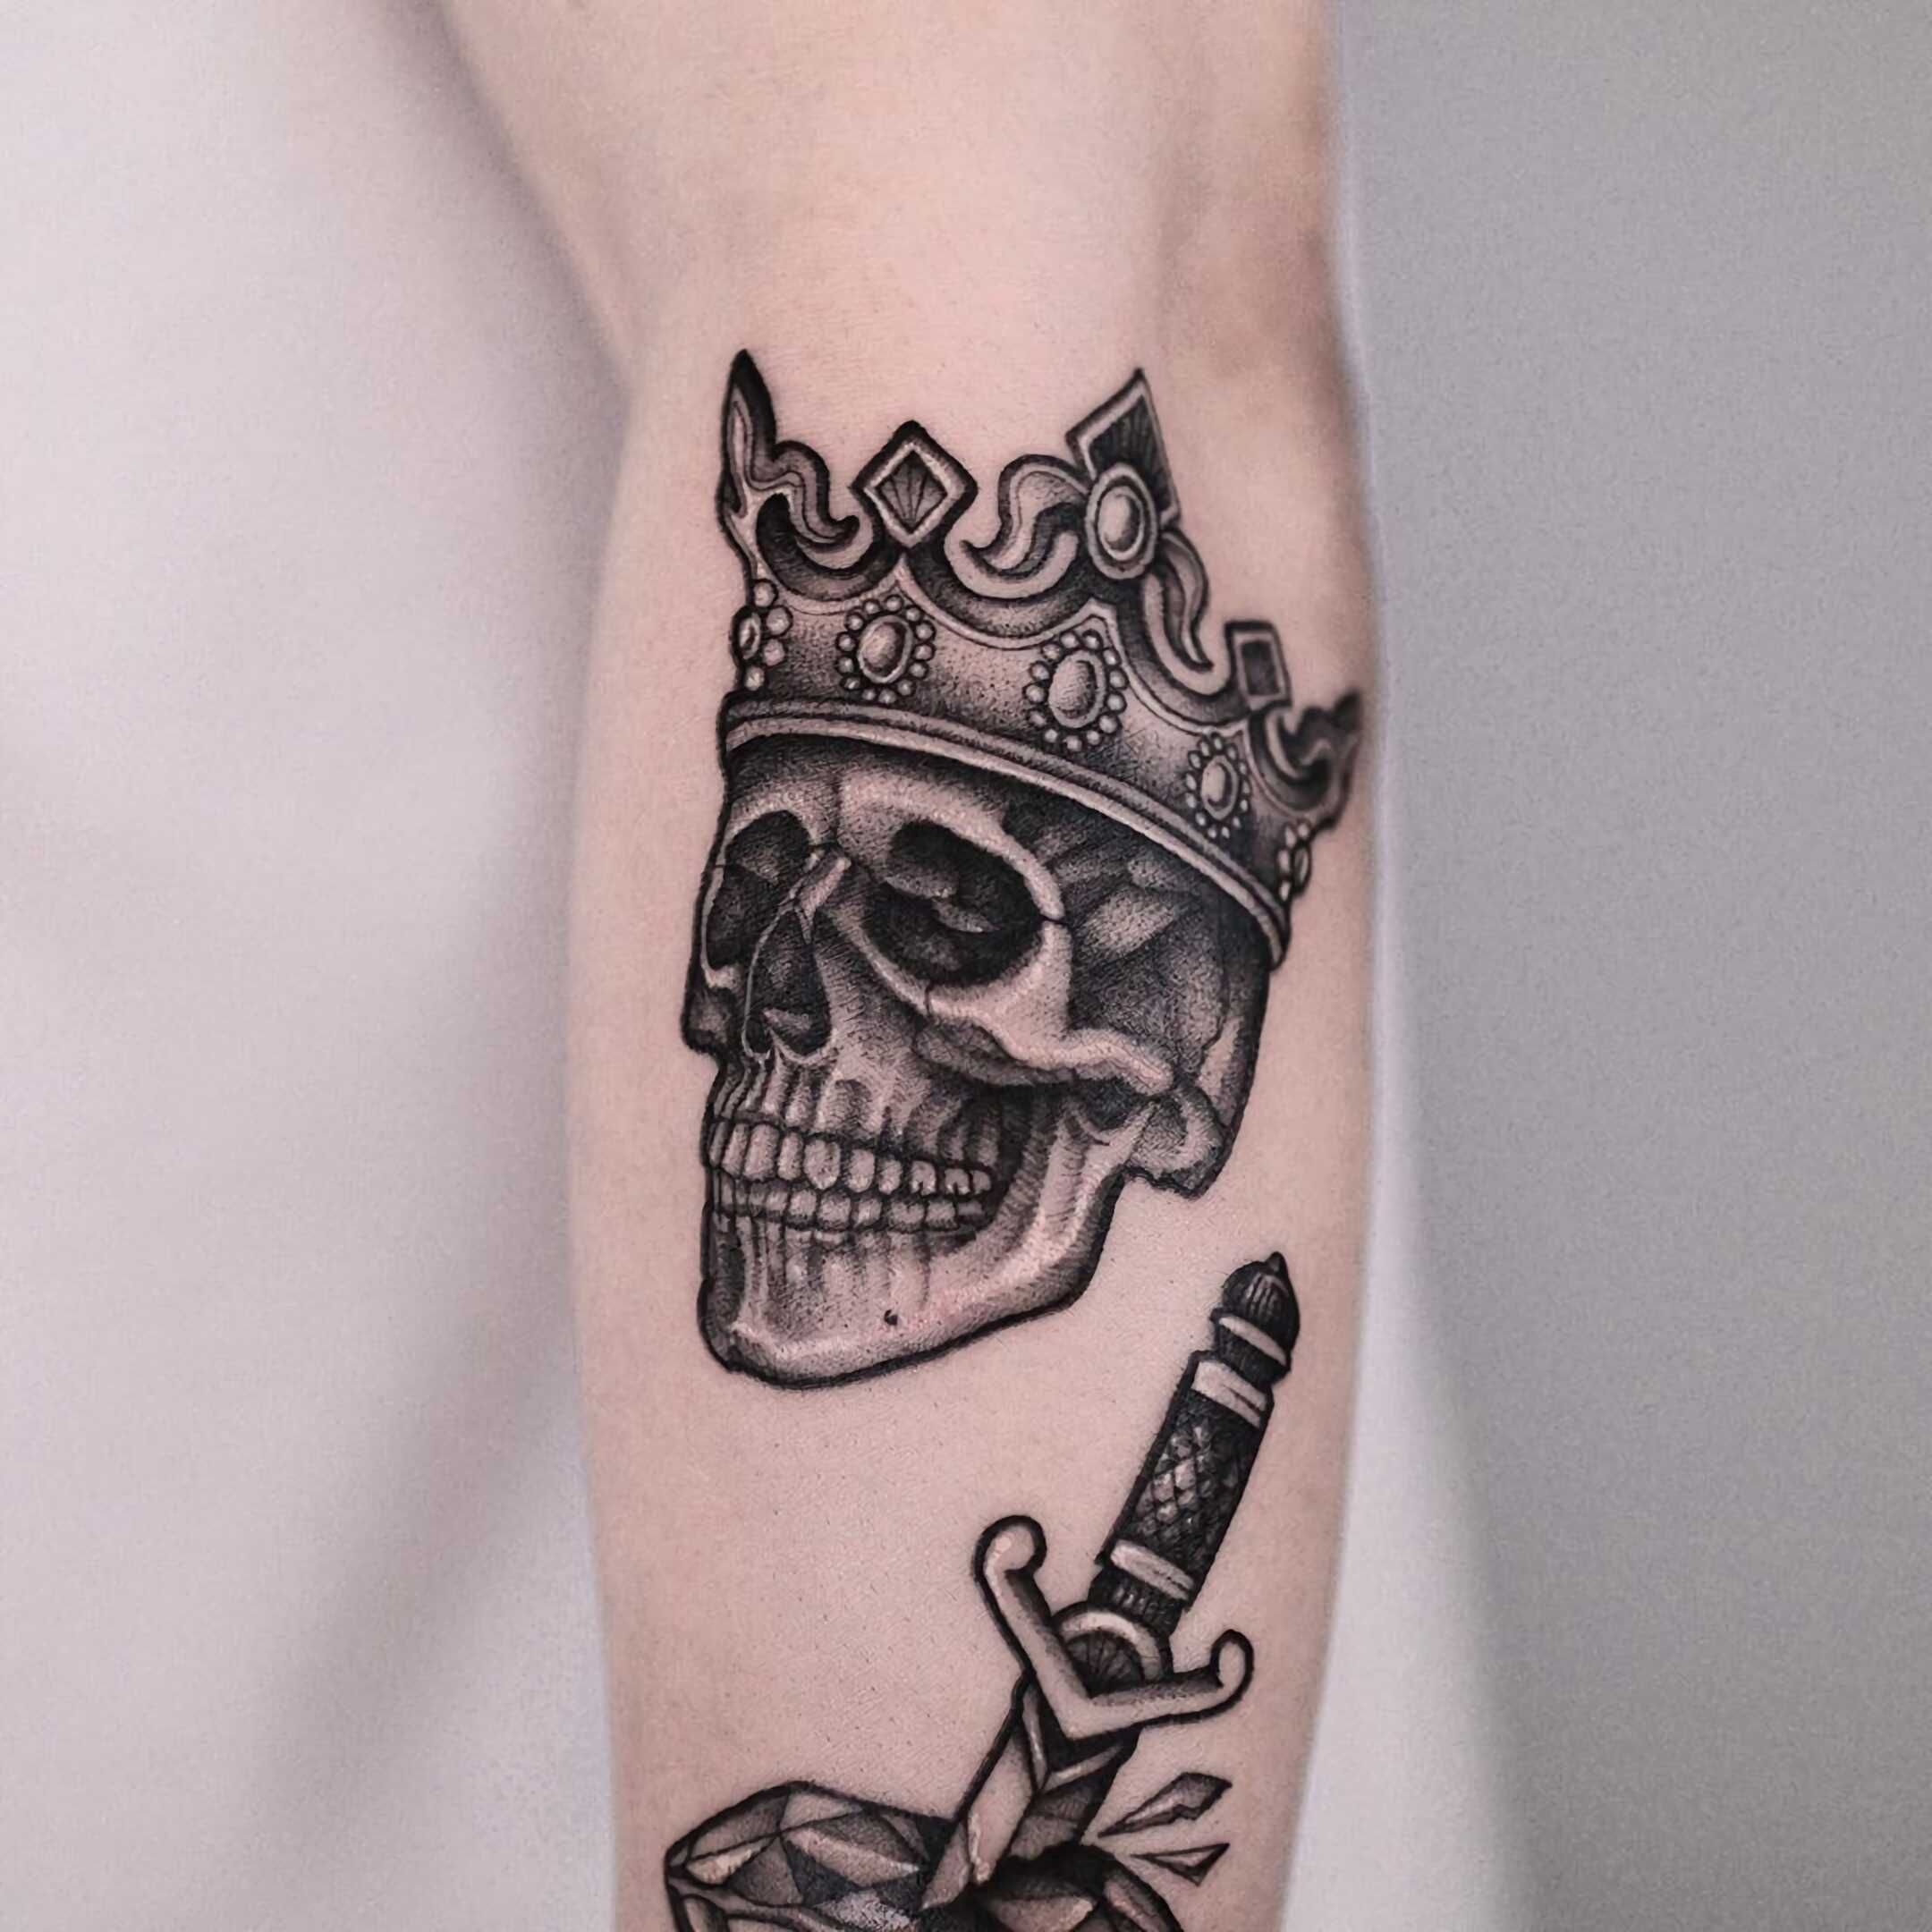 тату короны и черепа на руке